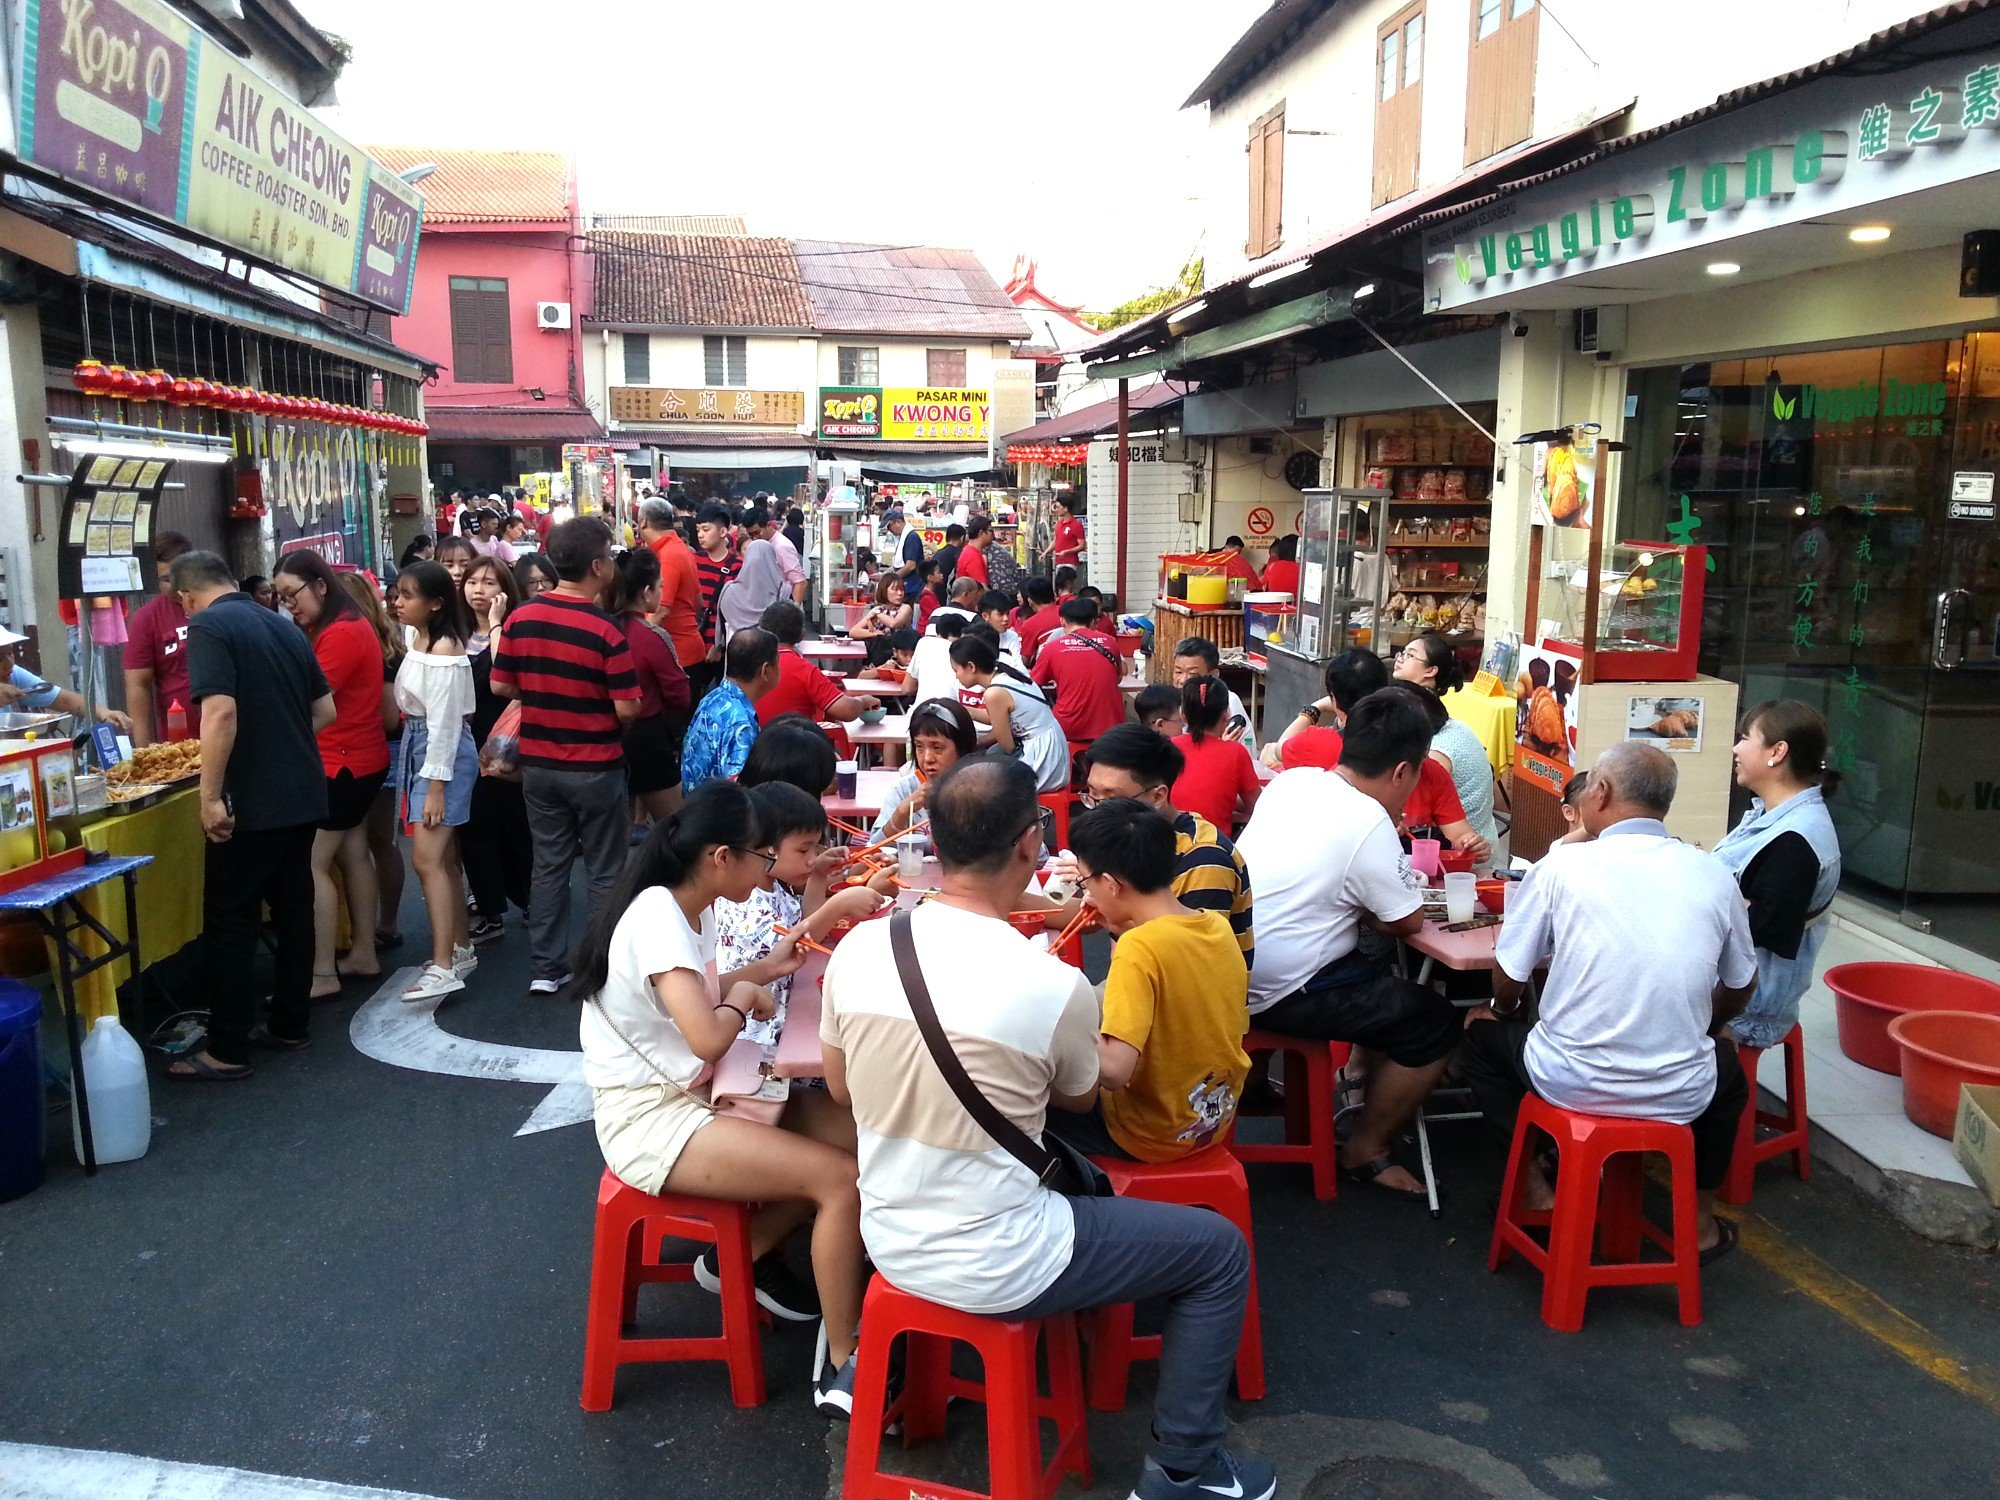 Food court at Jonker Walk Night Market